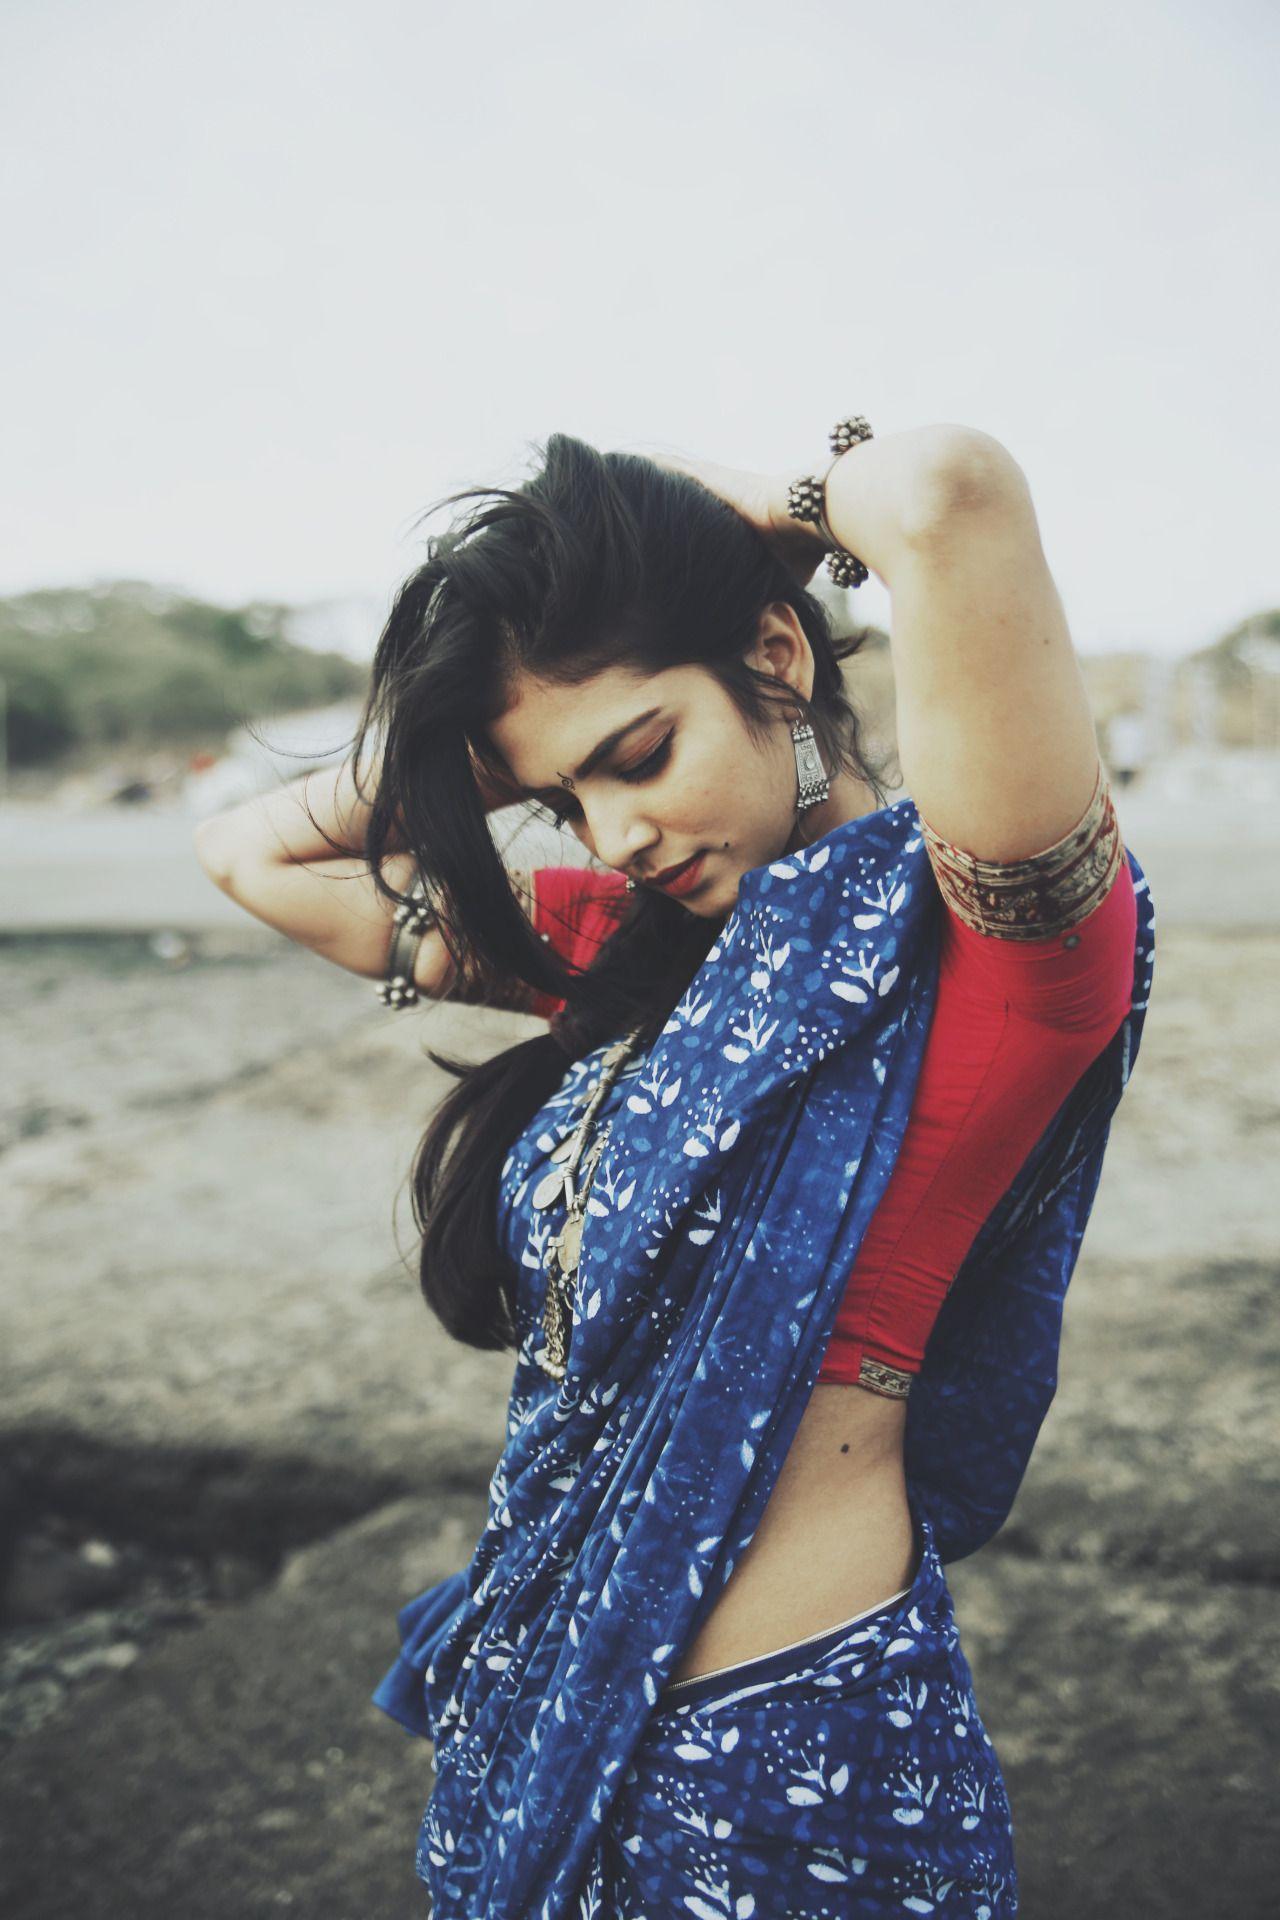 Tumblr Hot Indian Girls Delightful the scarlet window | devaya designs & indian outfit inspiration